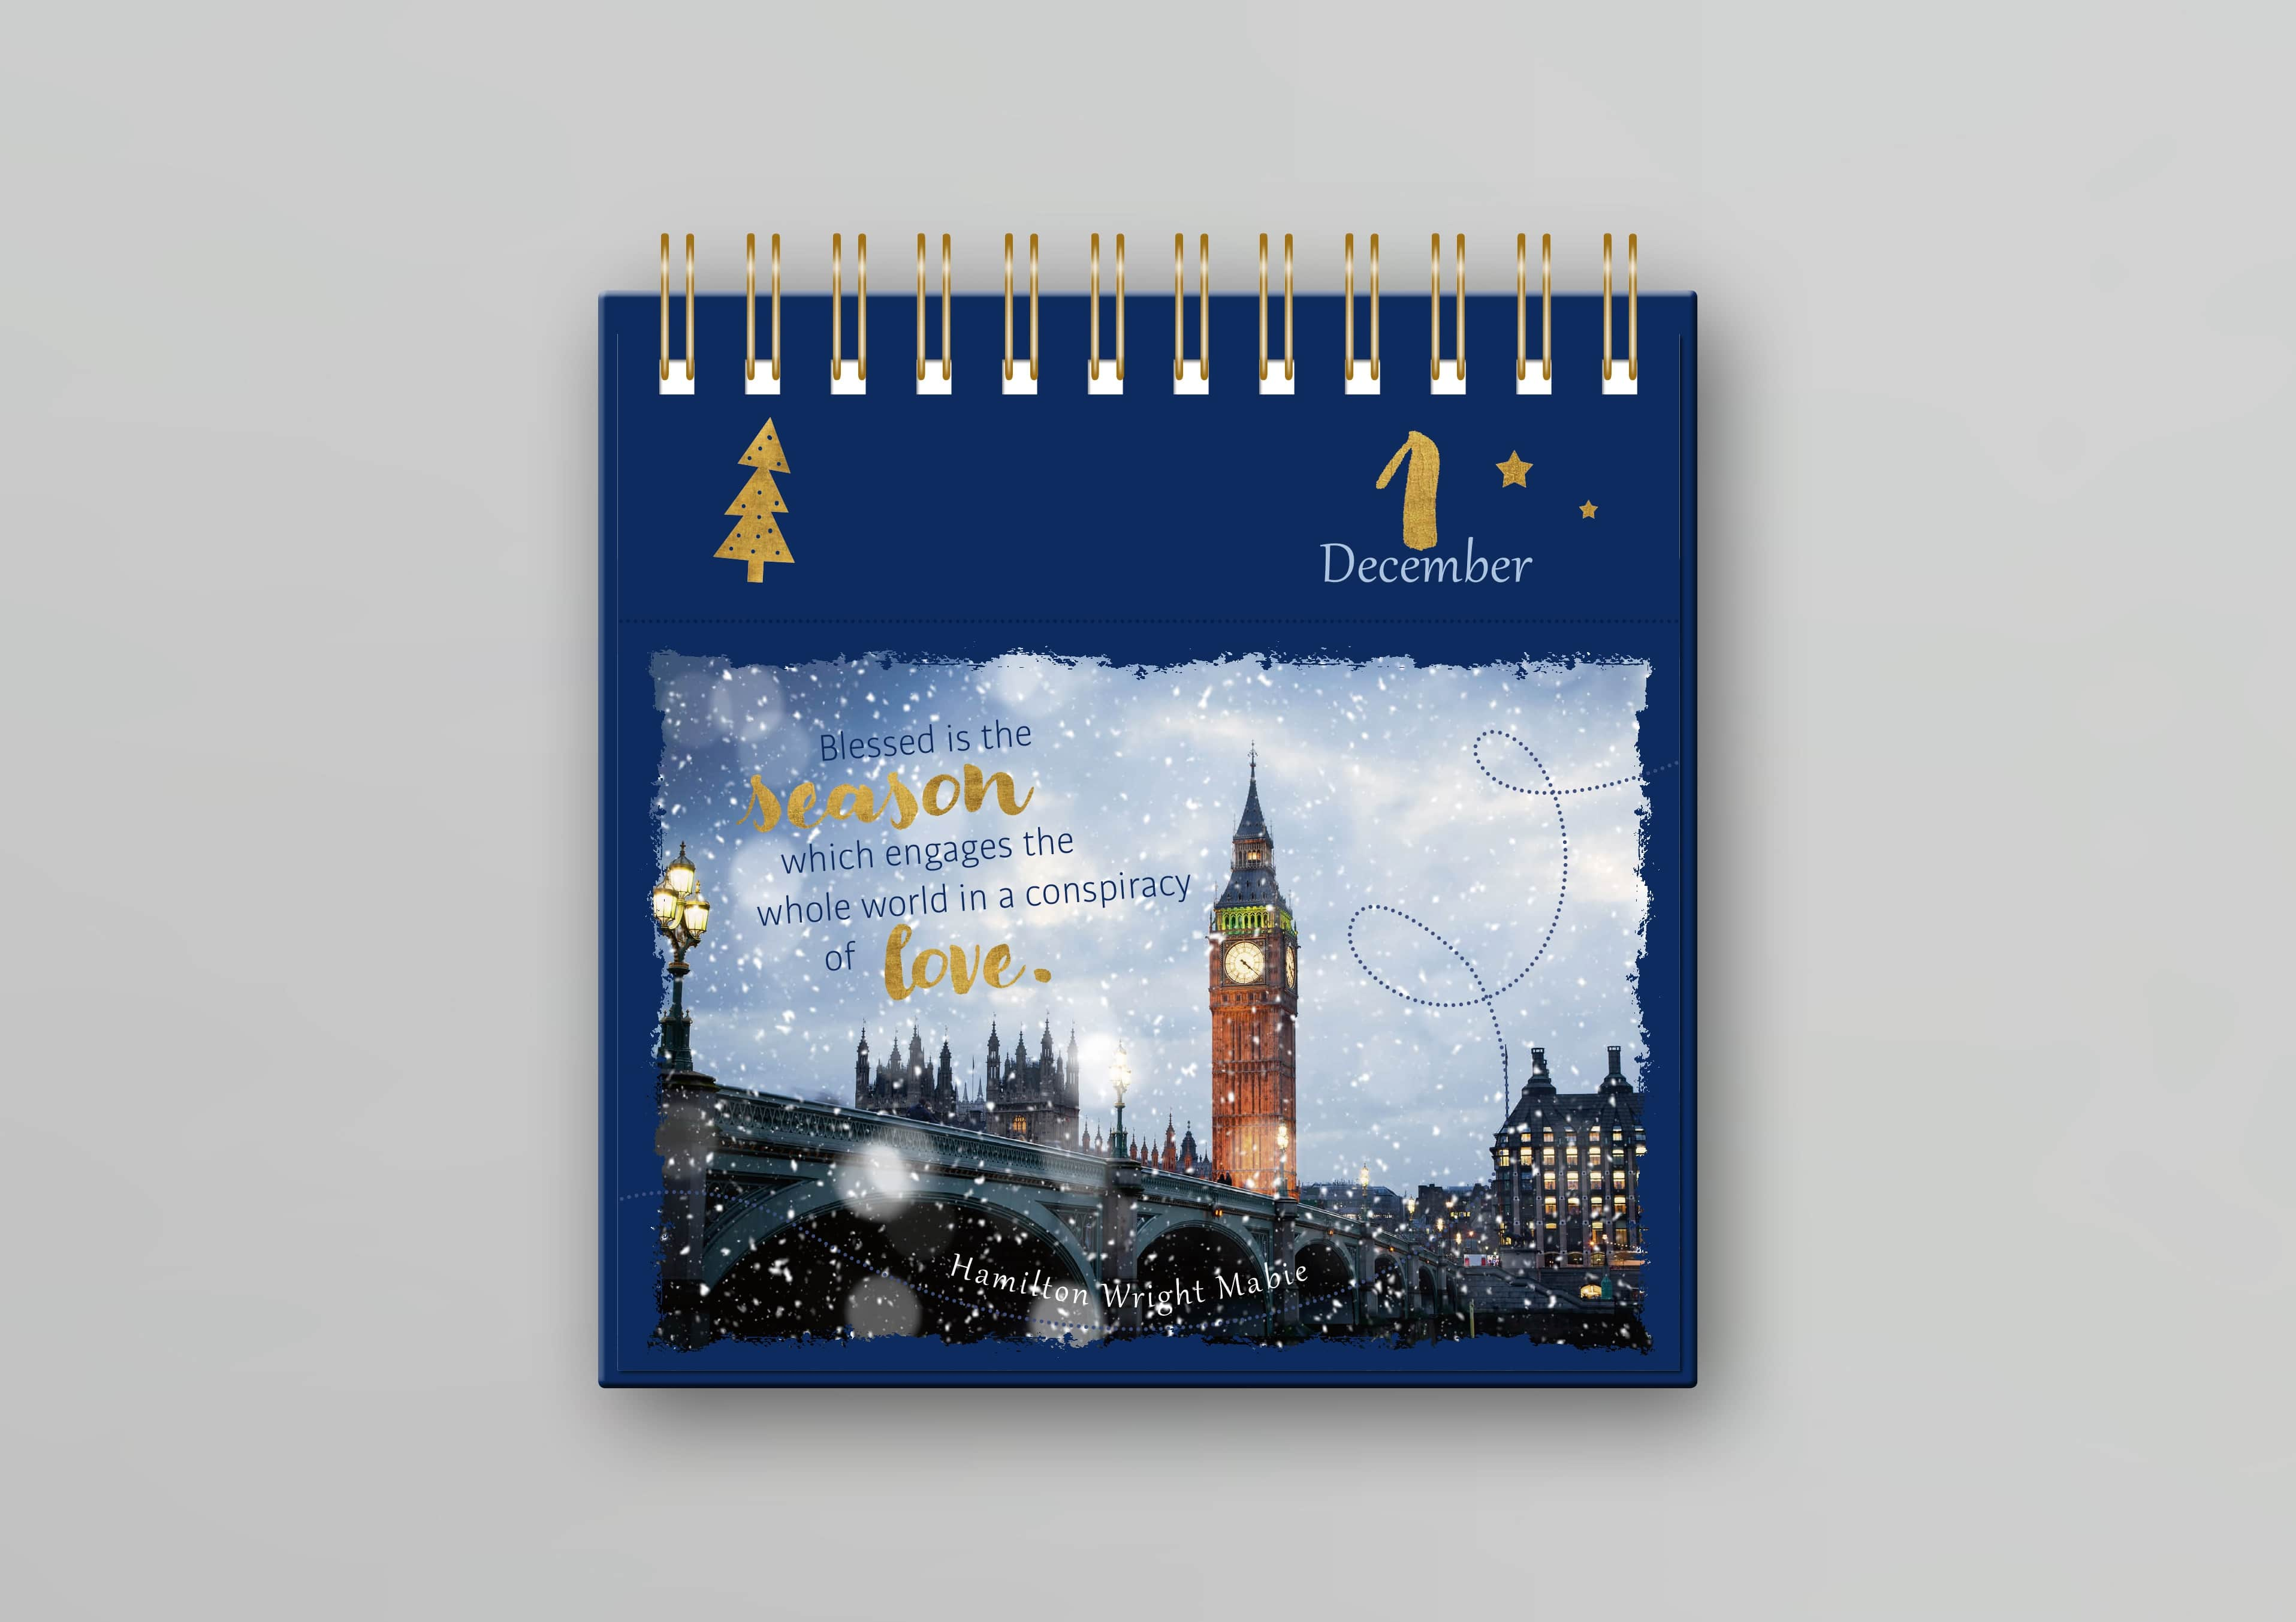 Langenscheidt-Kalender-GB-IN01